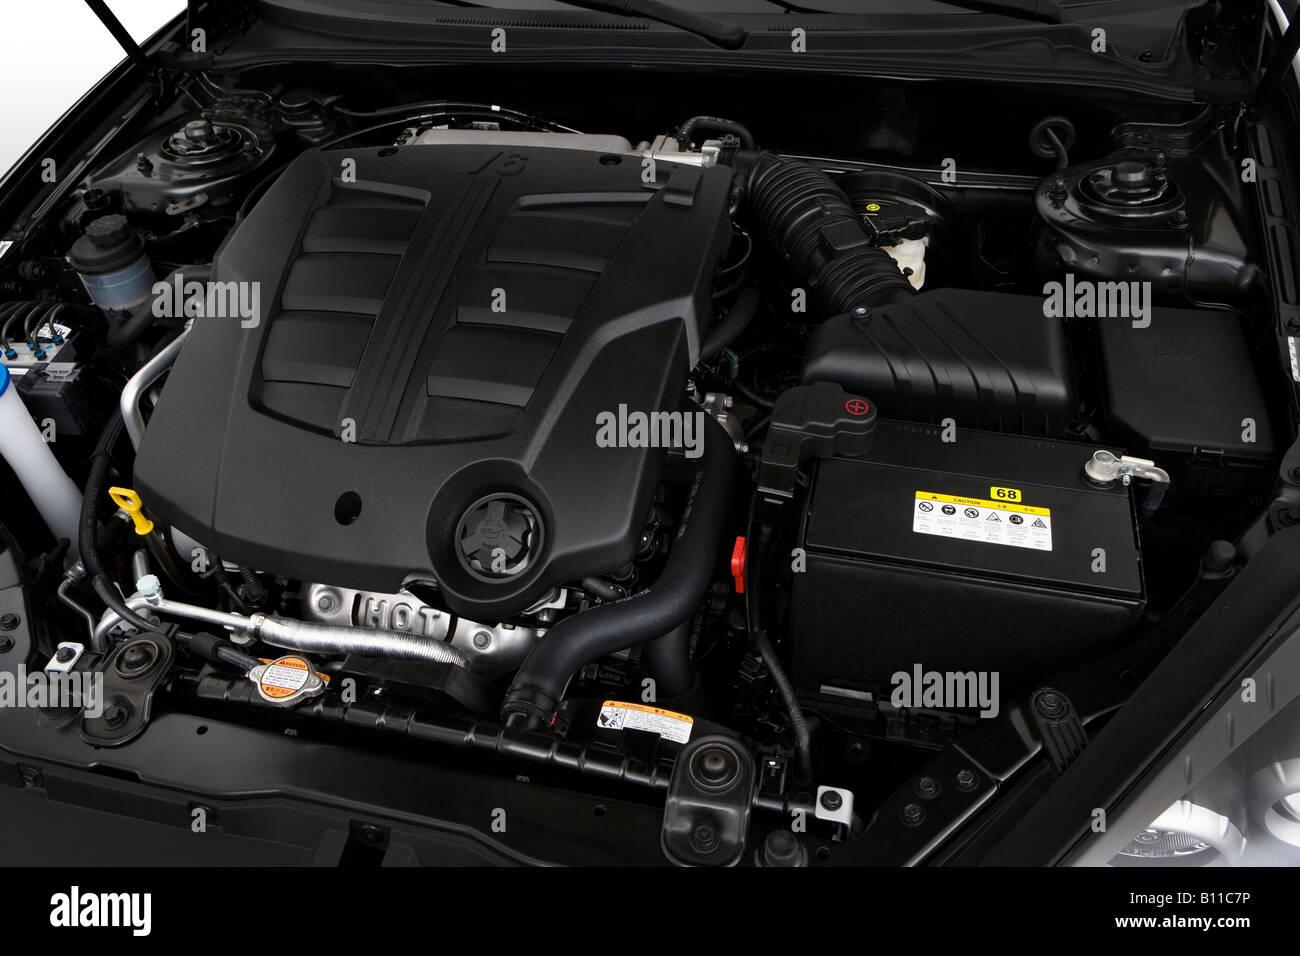 2008 Hyundai Tiburon GT Limited In Black   Engine   Stock Image